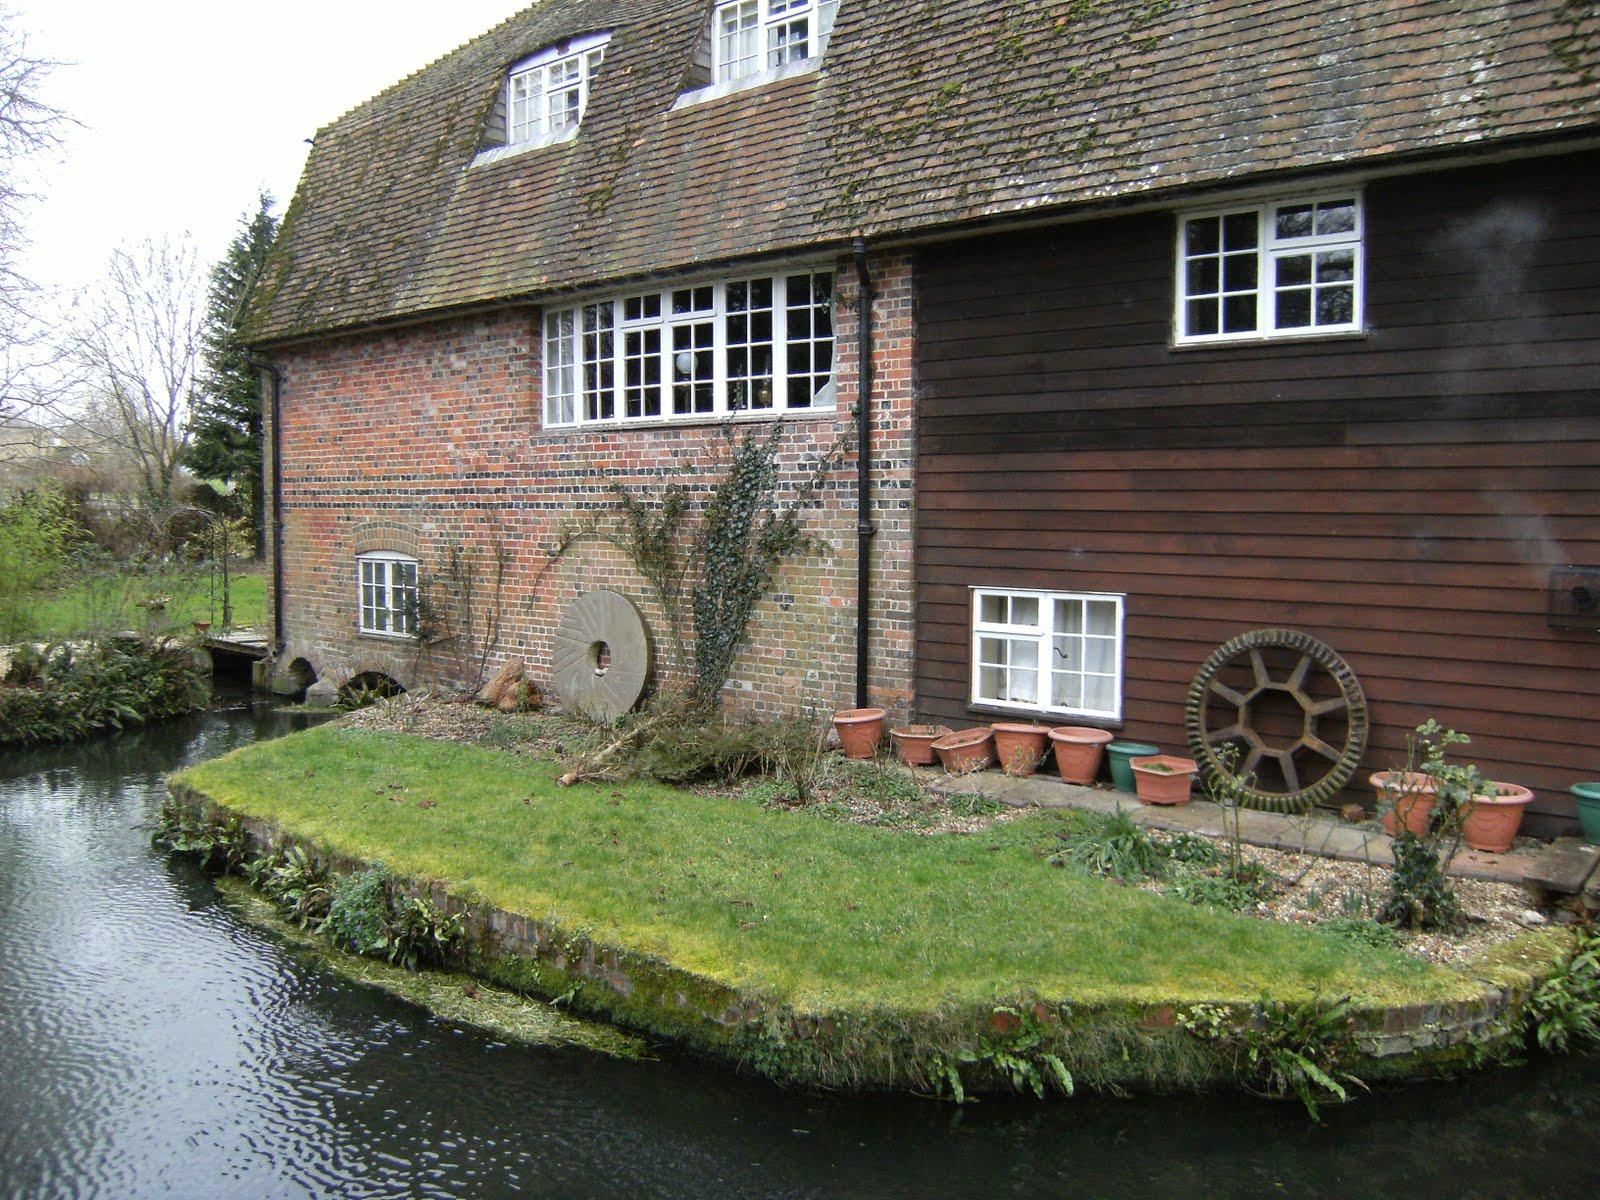 DSCF0266 Town Mill, Whitchurch